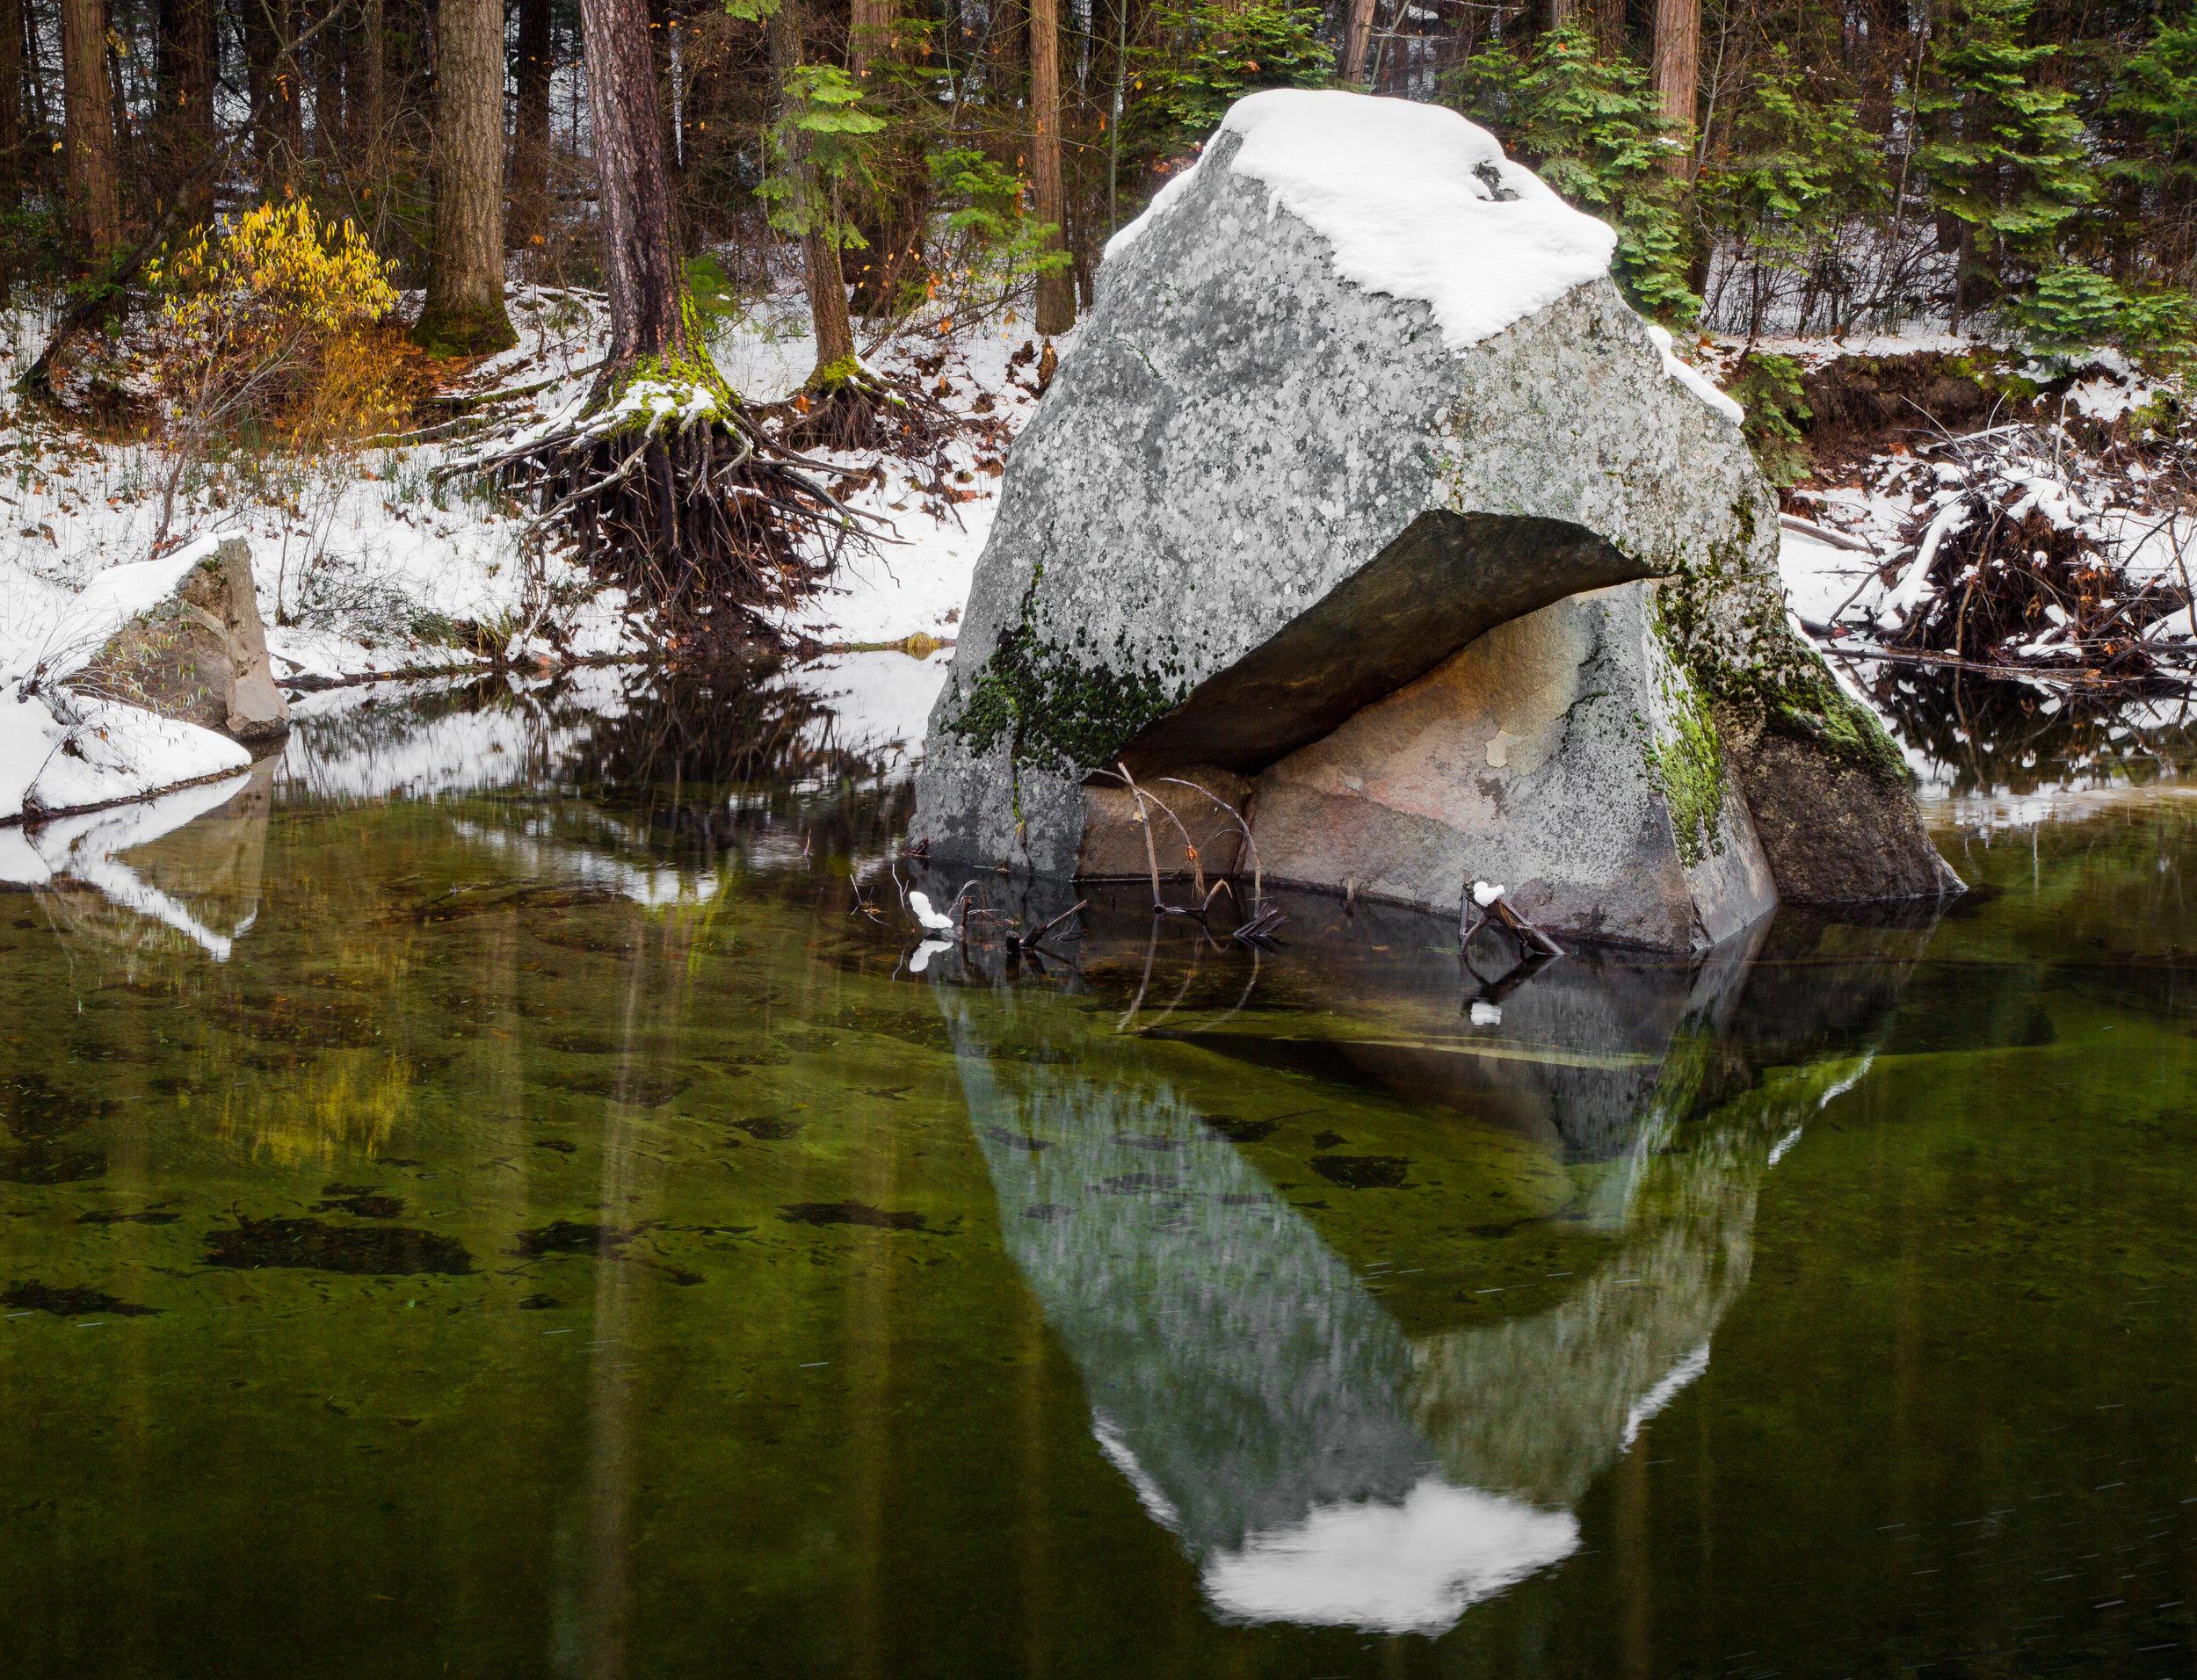 Rock, Merced River, Fall